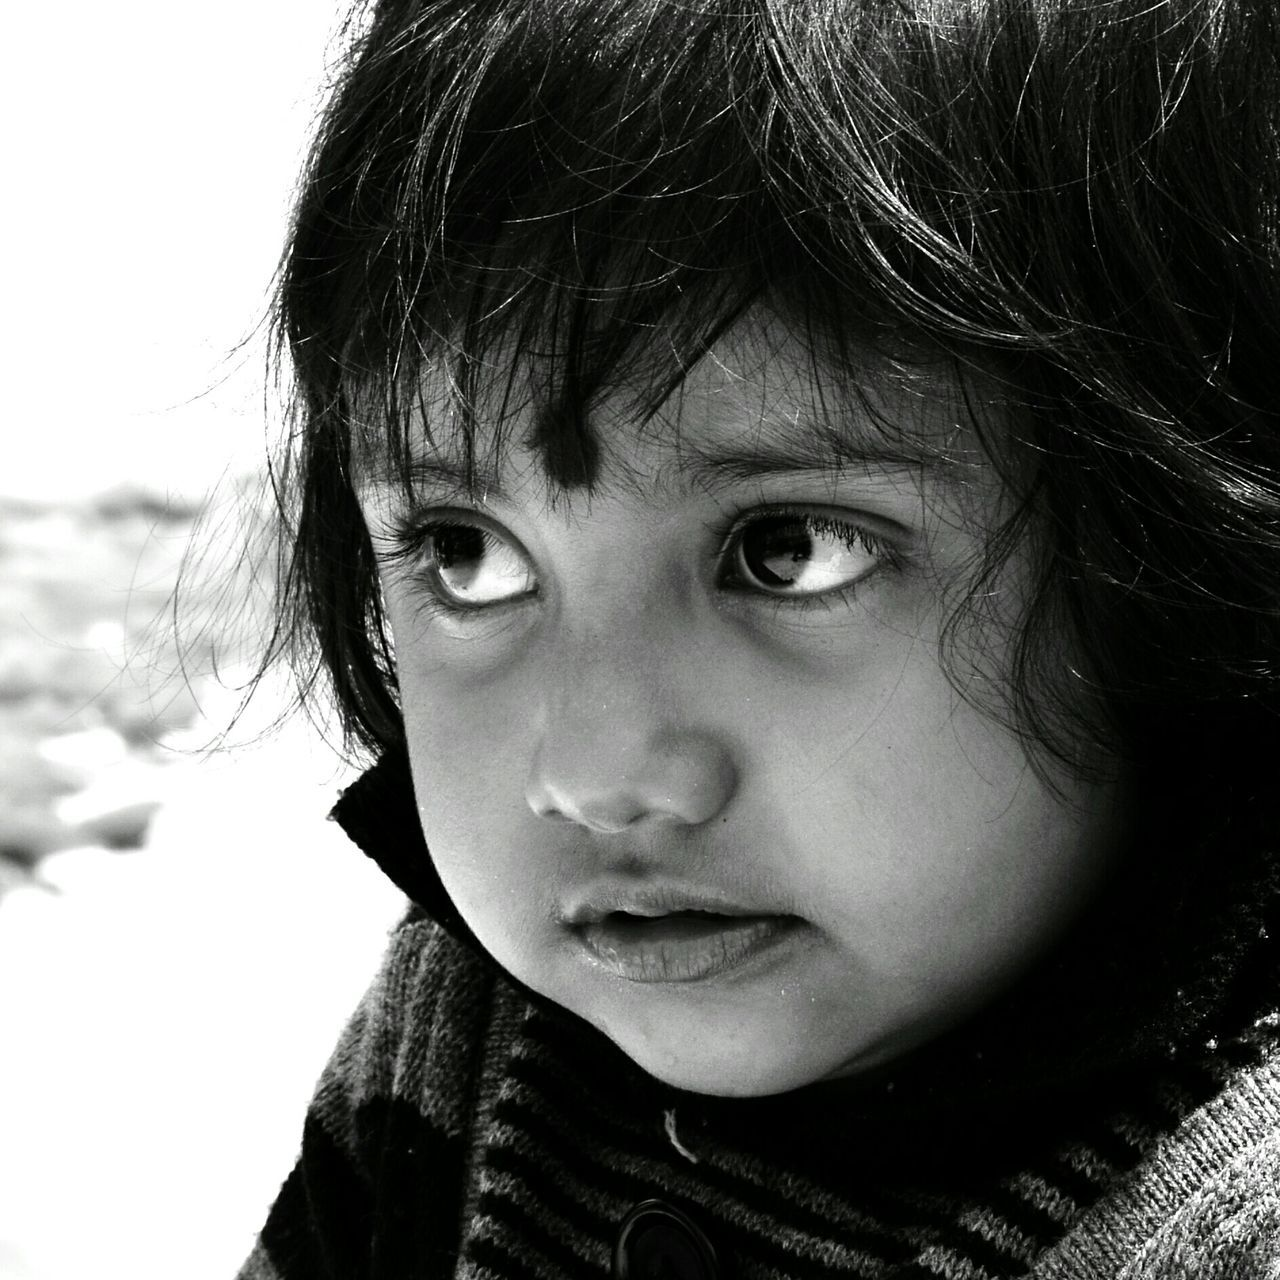 Monochrome Photography Monochrome Little Girl Girl Photo Of The Week